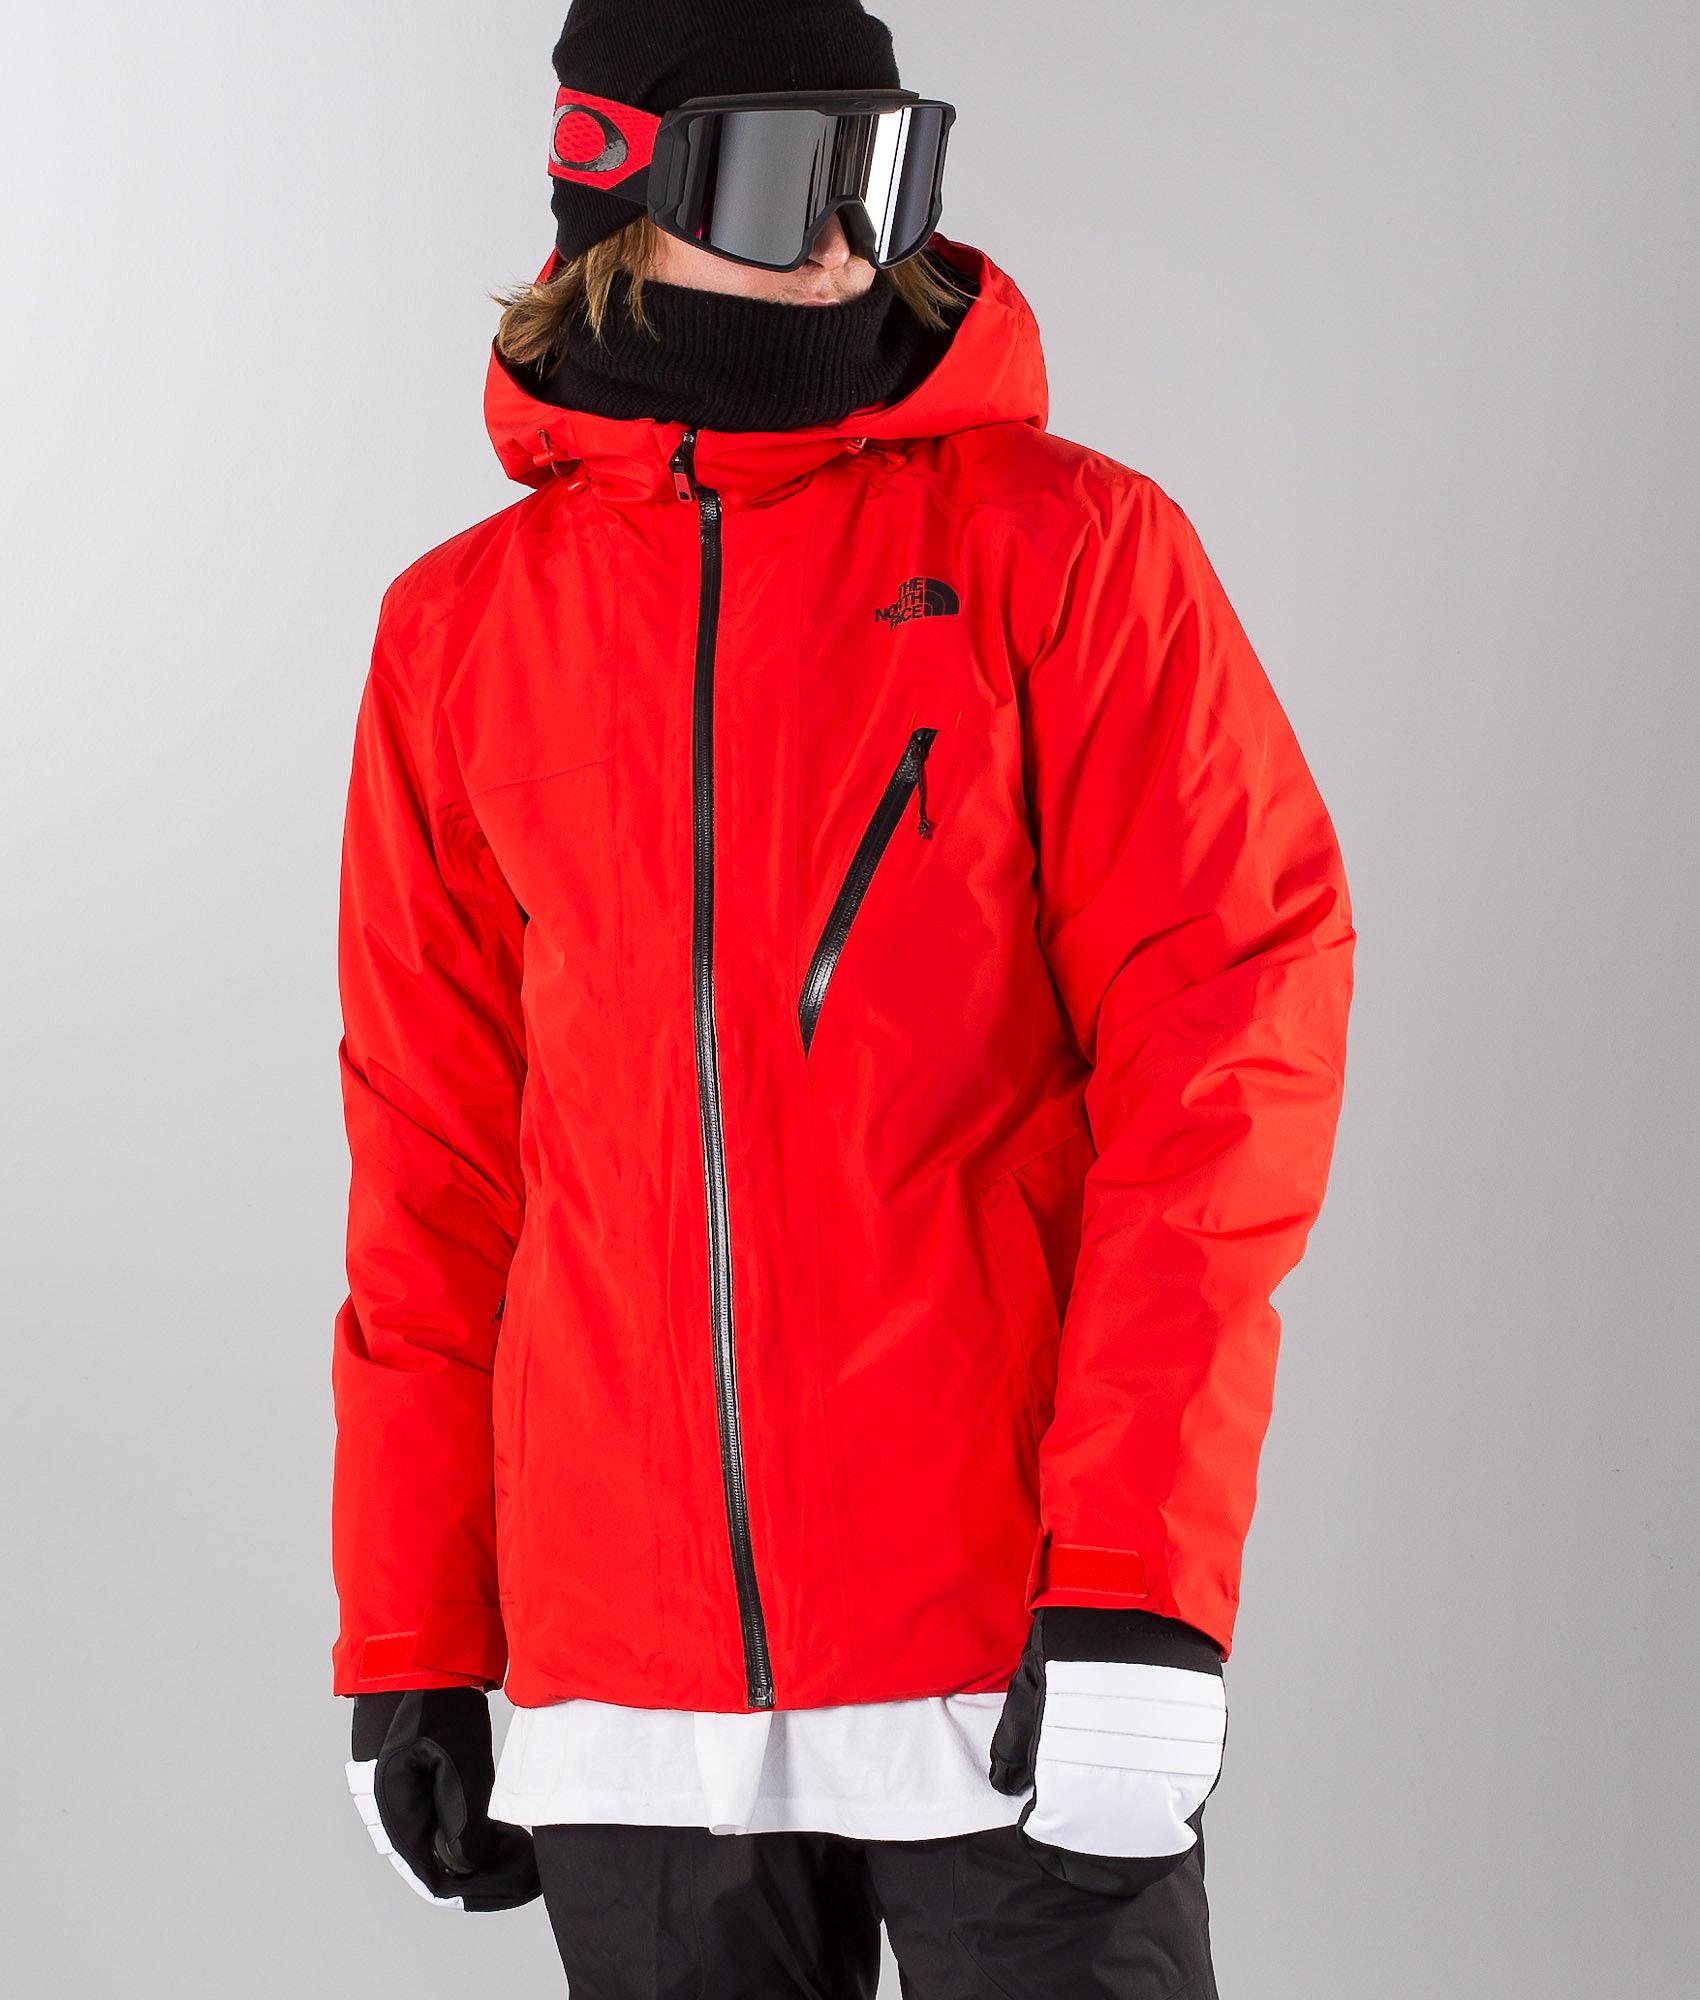 33b908d287 The North Face Descendit Snowboard Jacket Fiery Red - Ridestore.com